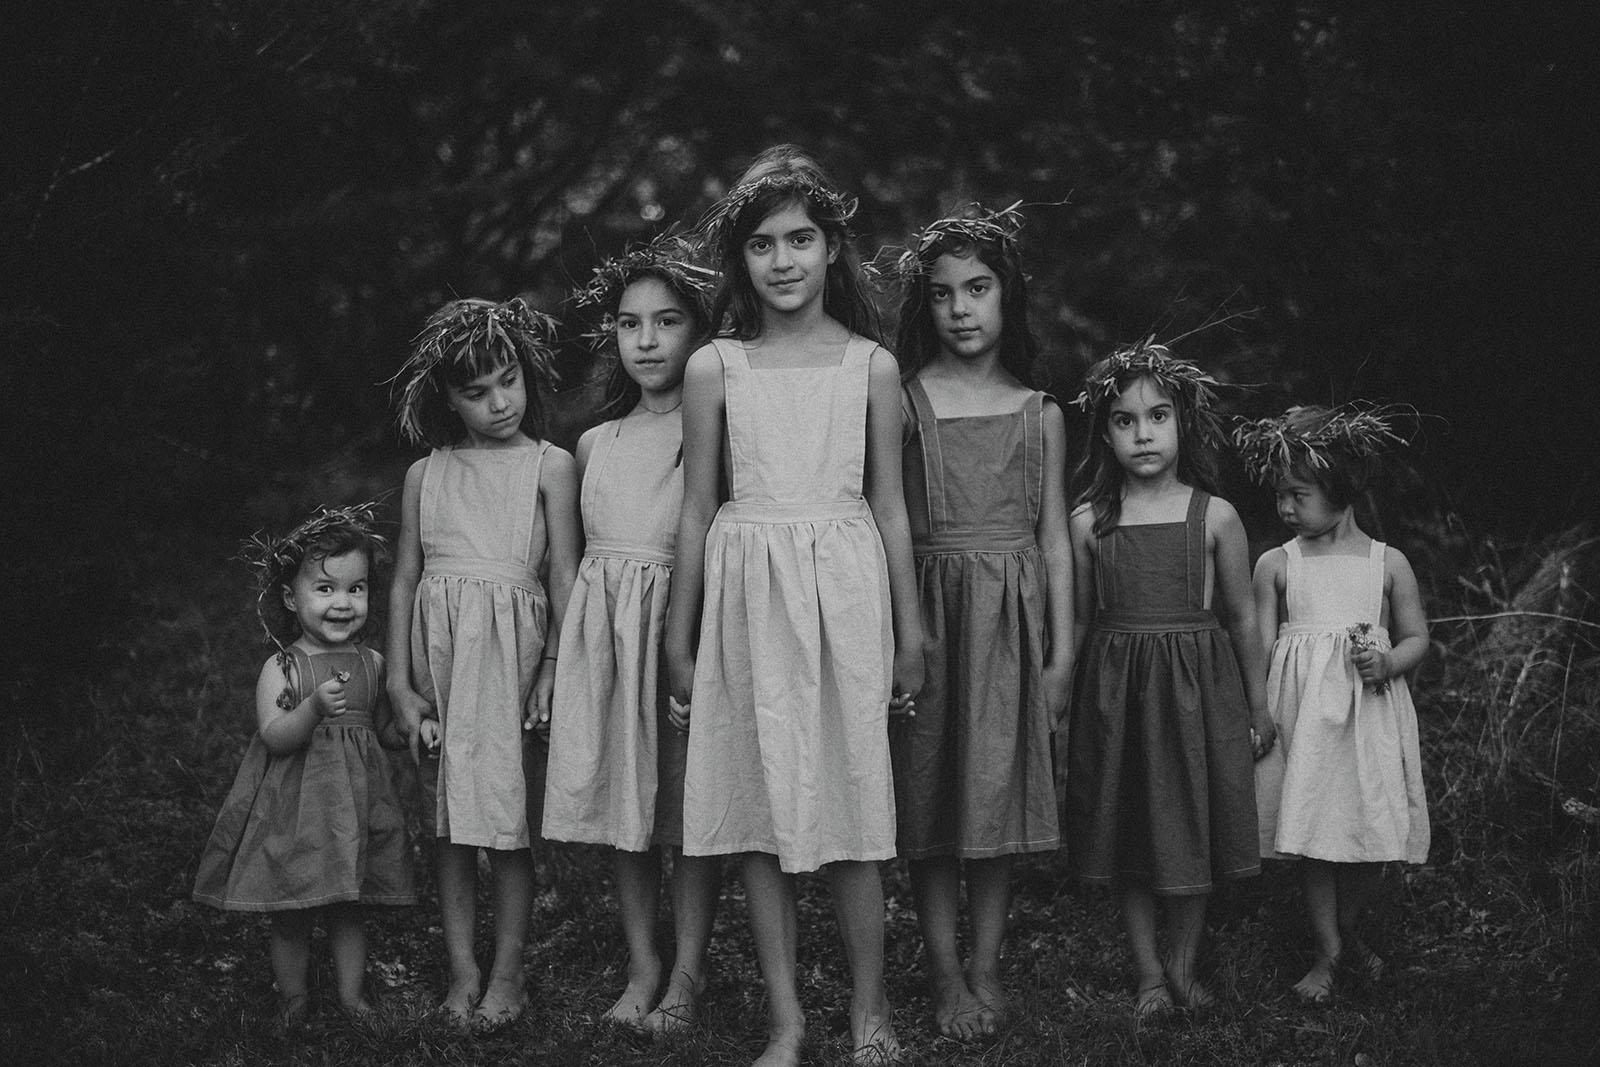 Katie Metka - Prolific women photographers changing the industry